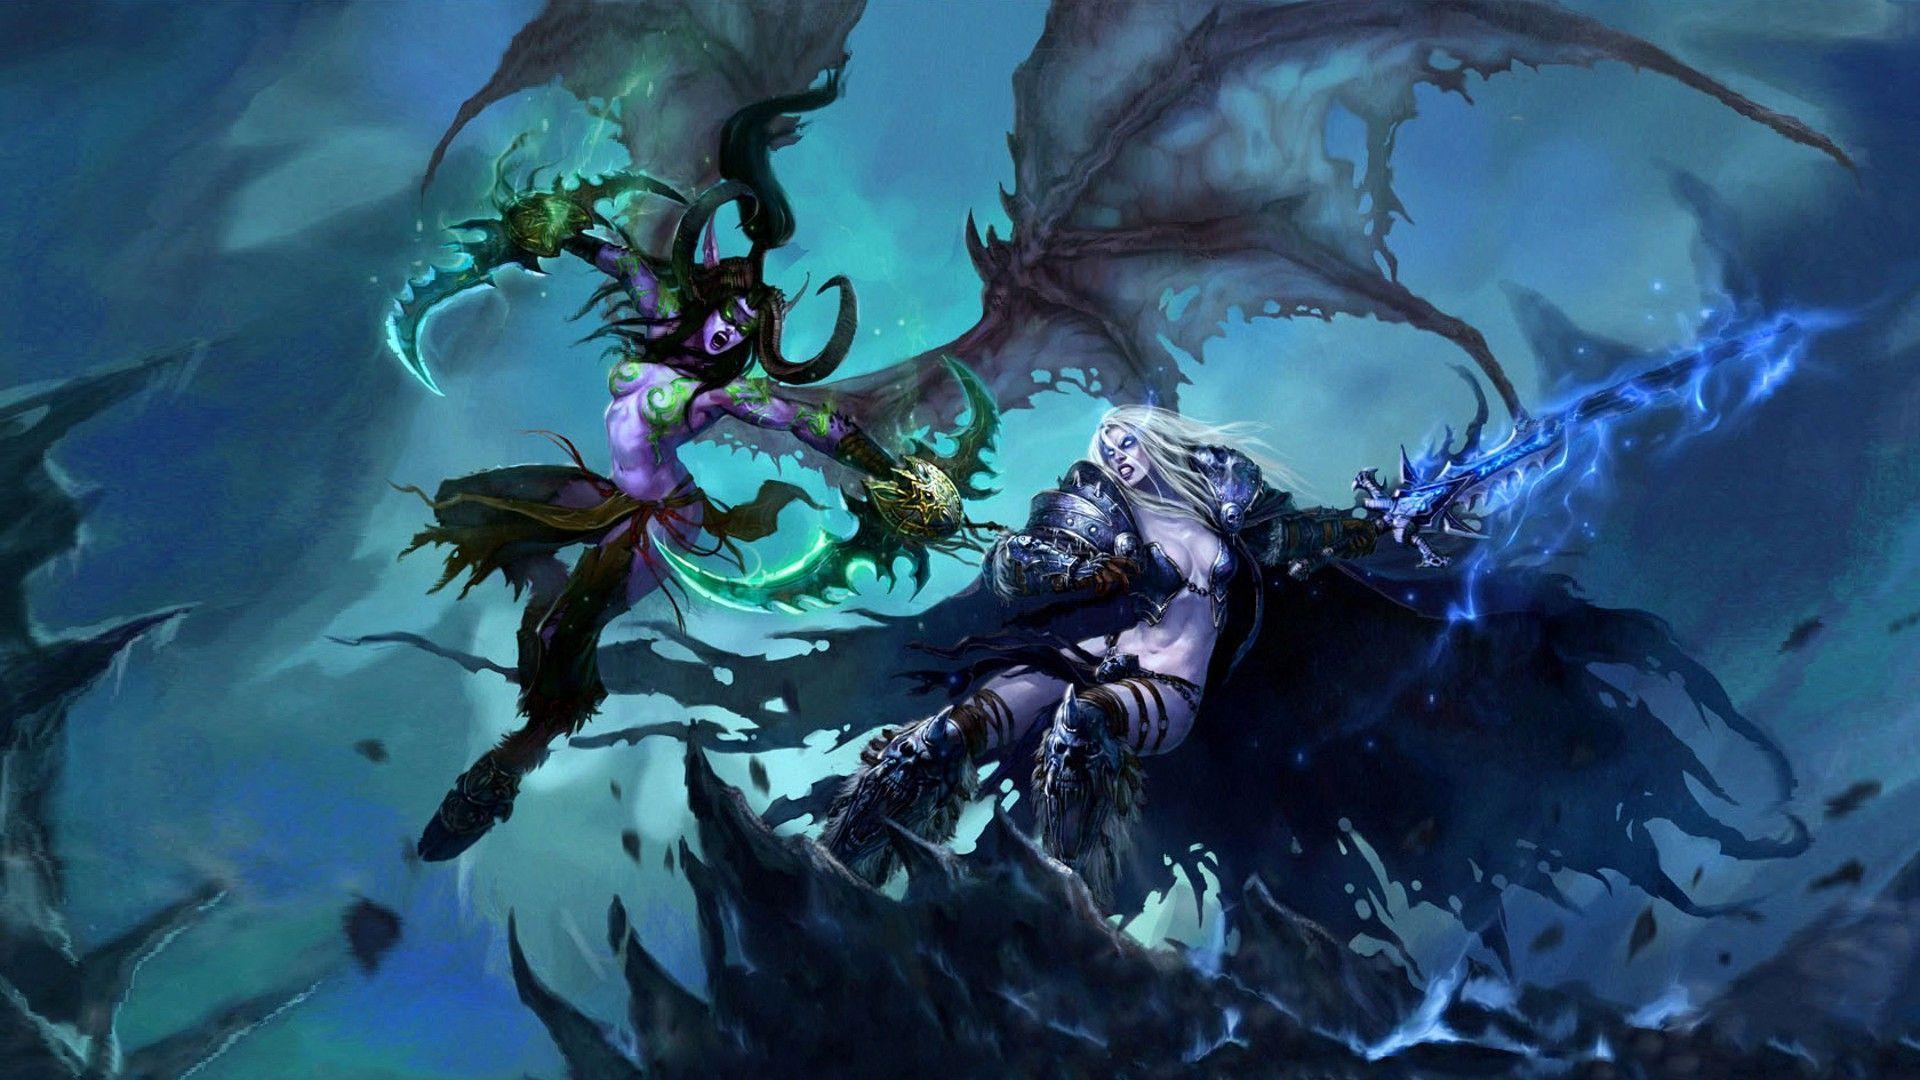 Illidan Vs Sylvanas World Of Warcraft Wallpaper World Of